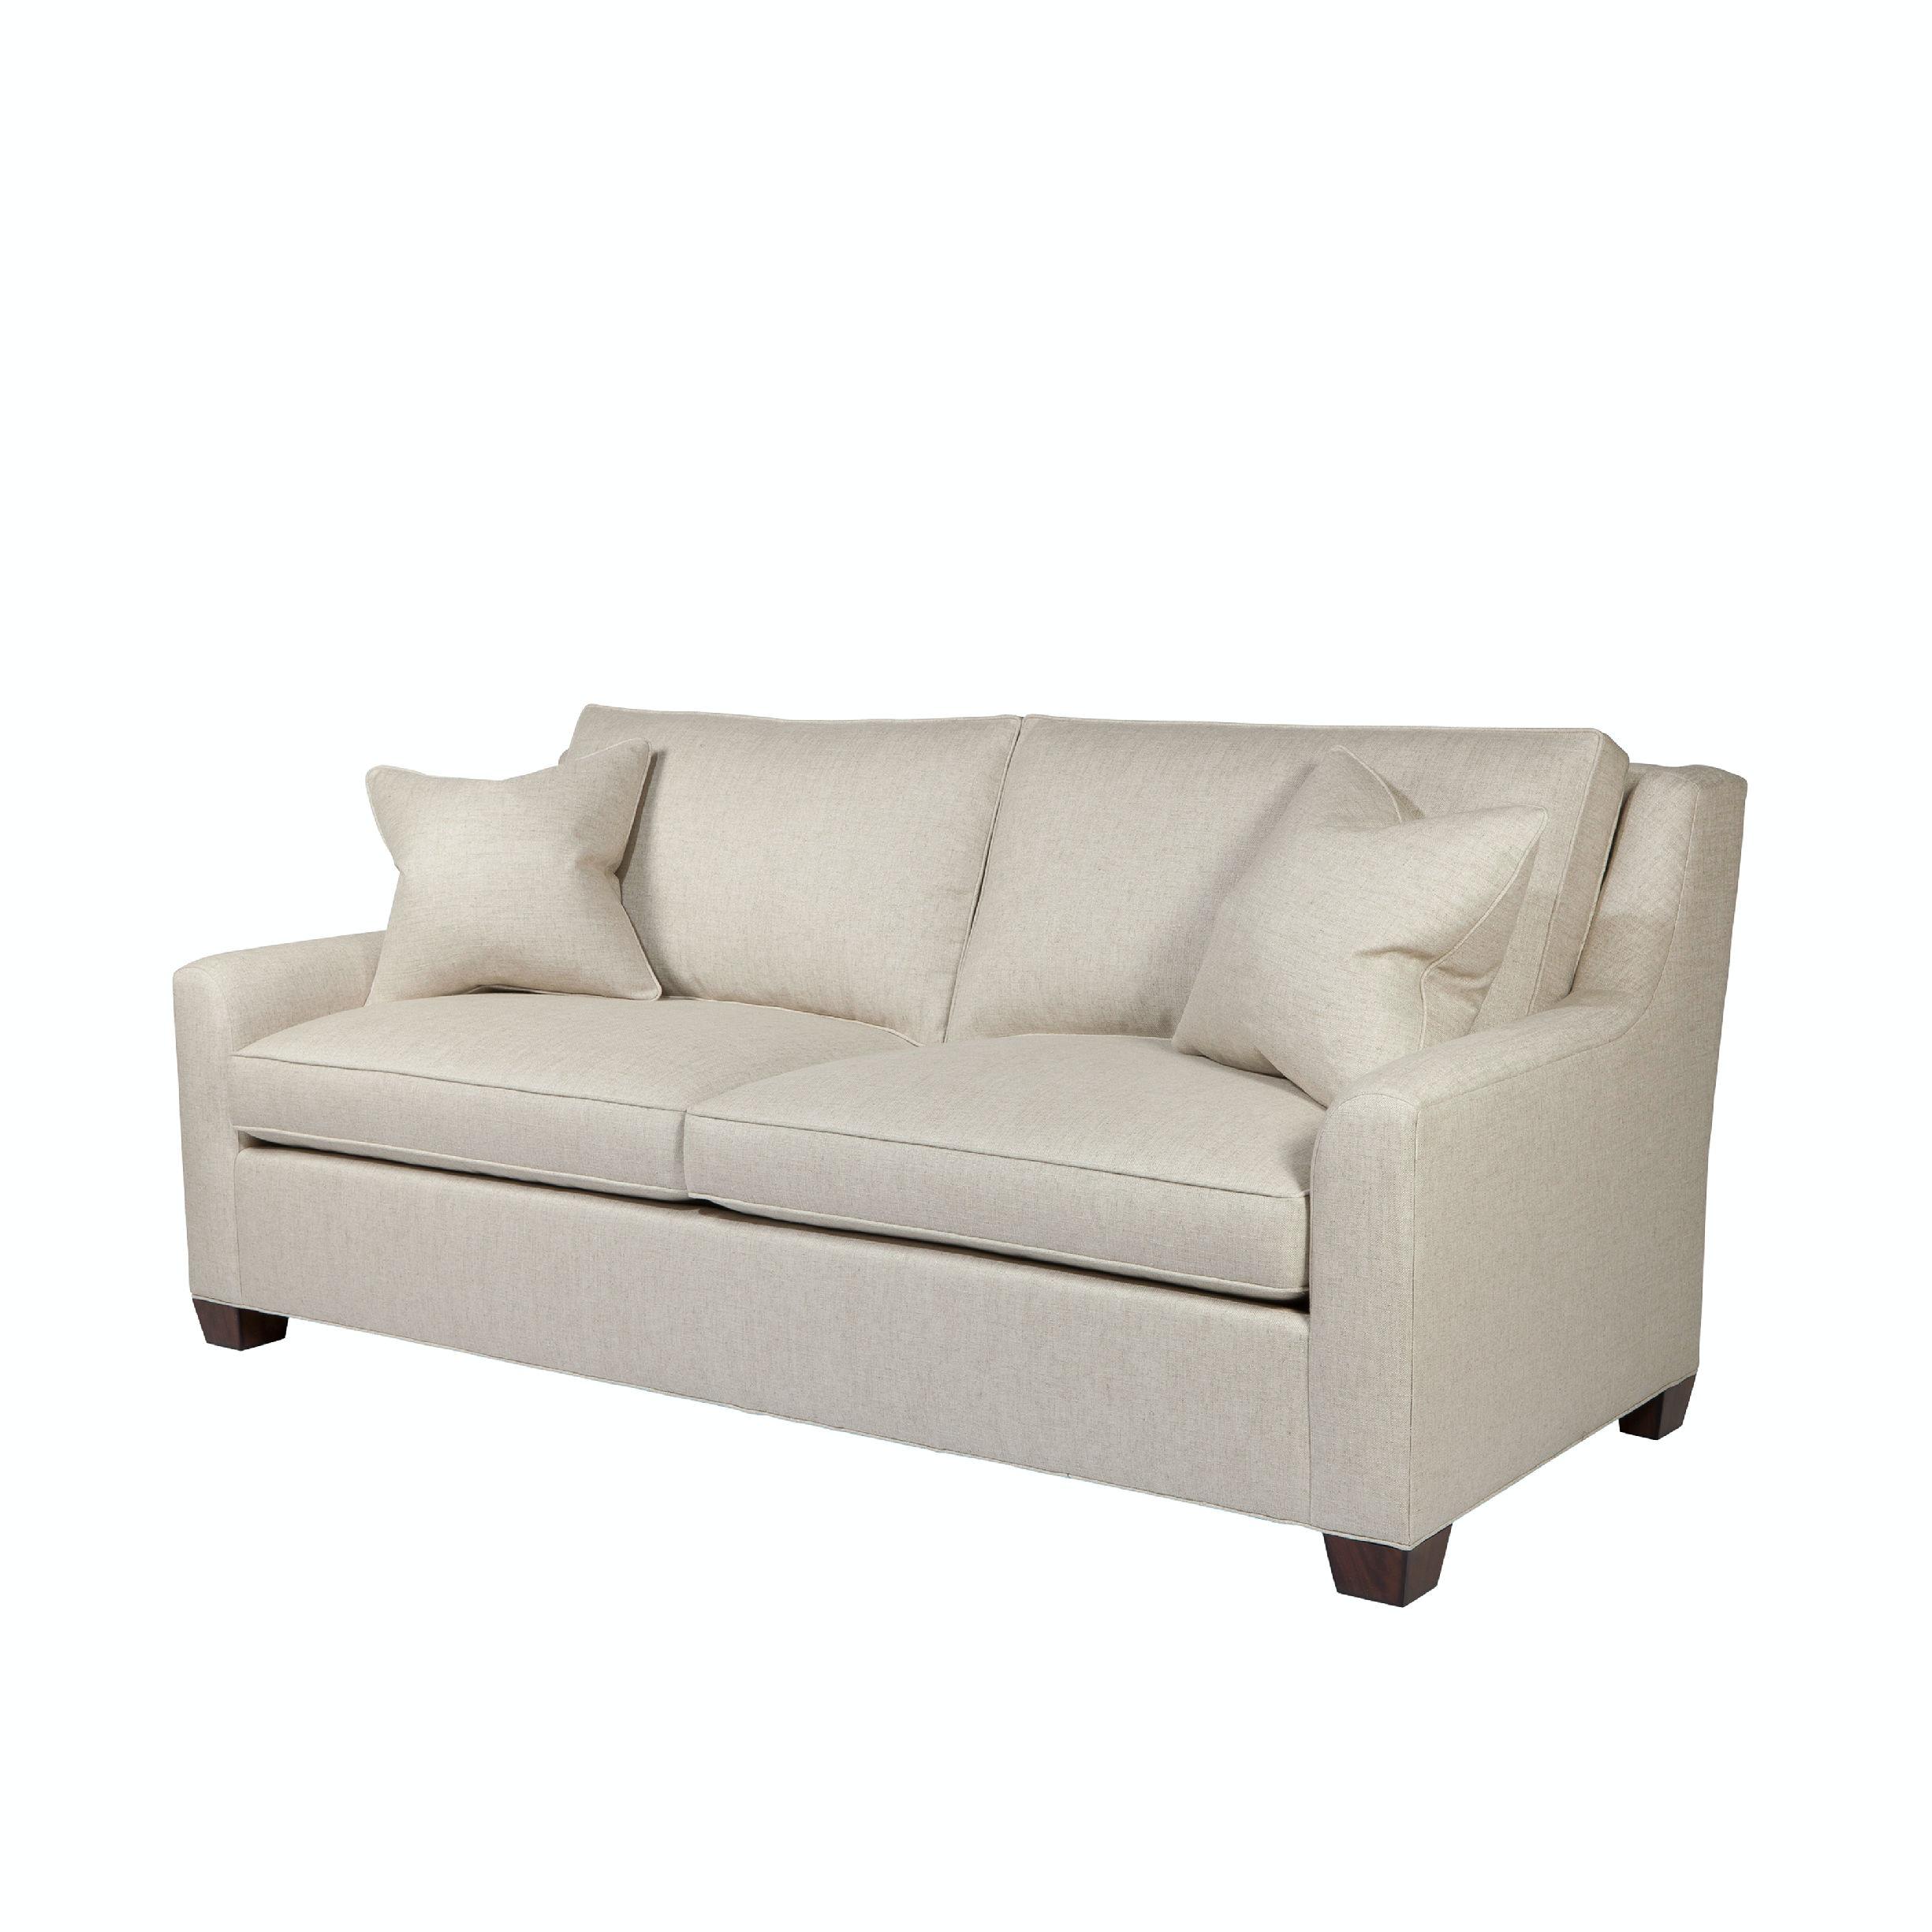 Delightful Theodore Alexander Living Room Lucie, Sofa 615 20   Bacons Furniture   Port  Charlotte, FL